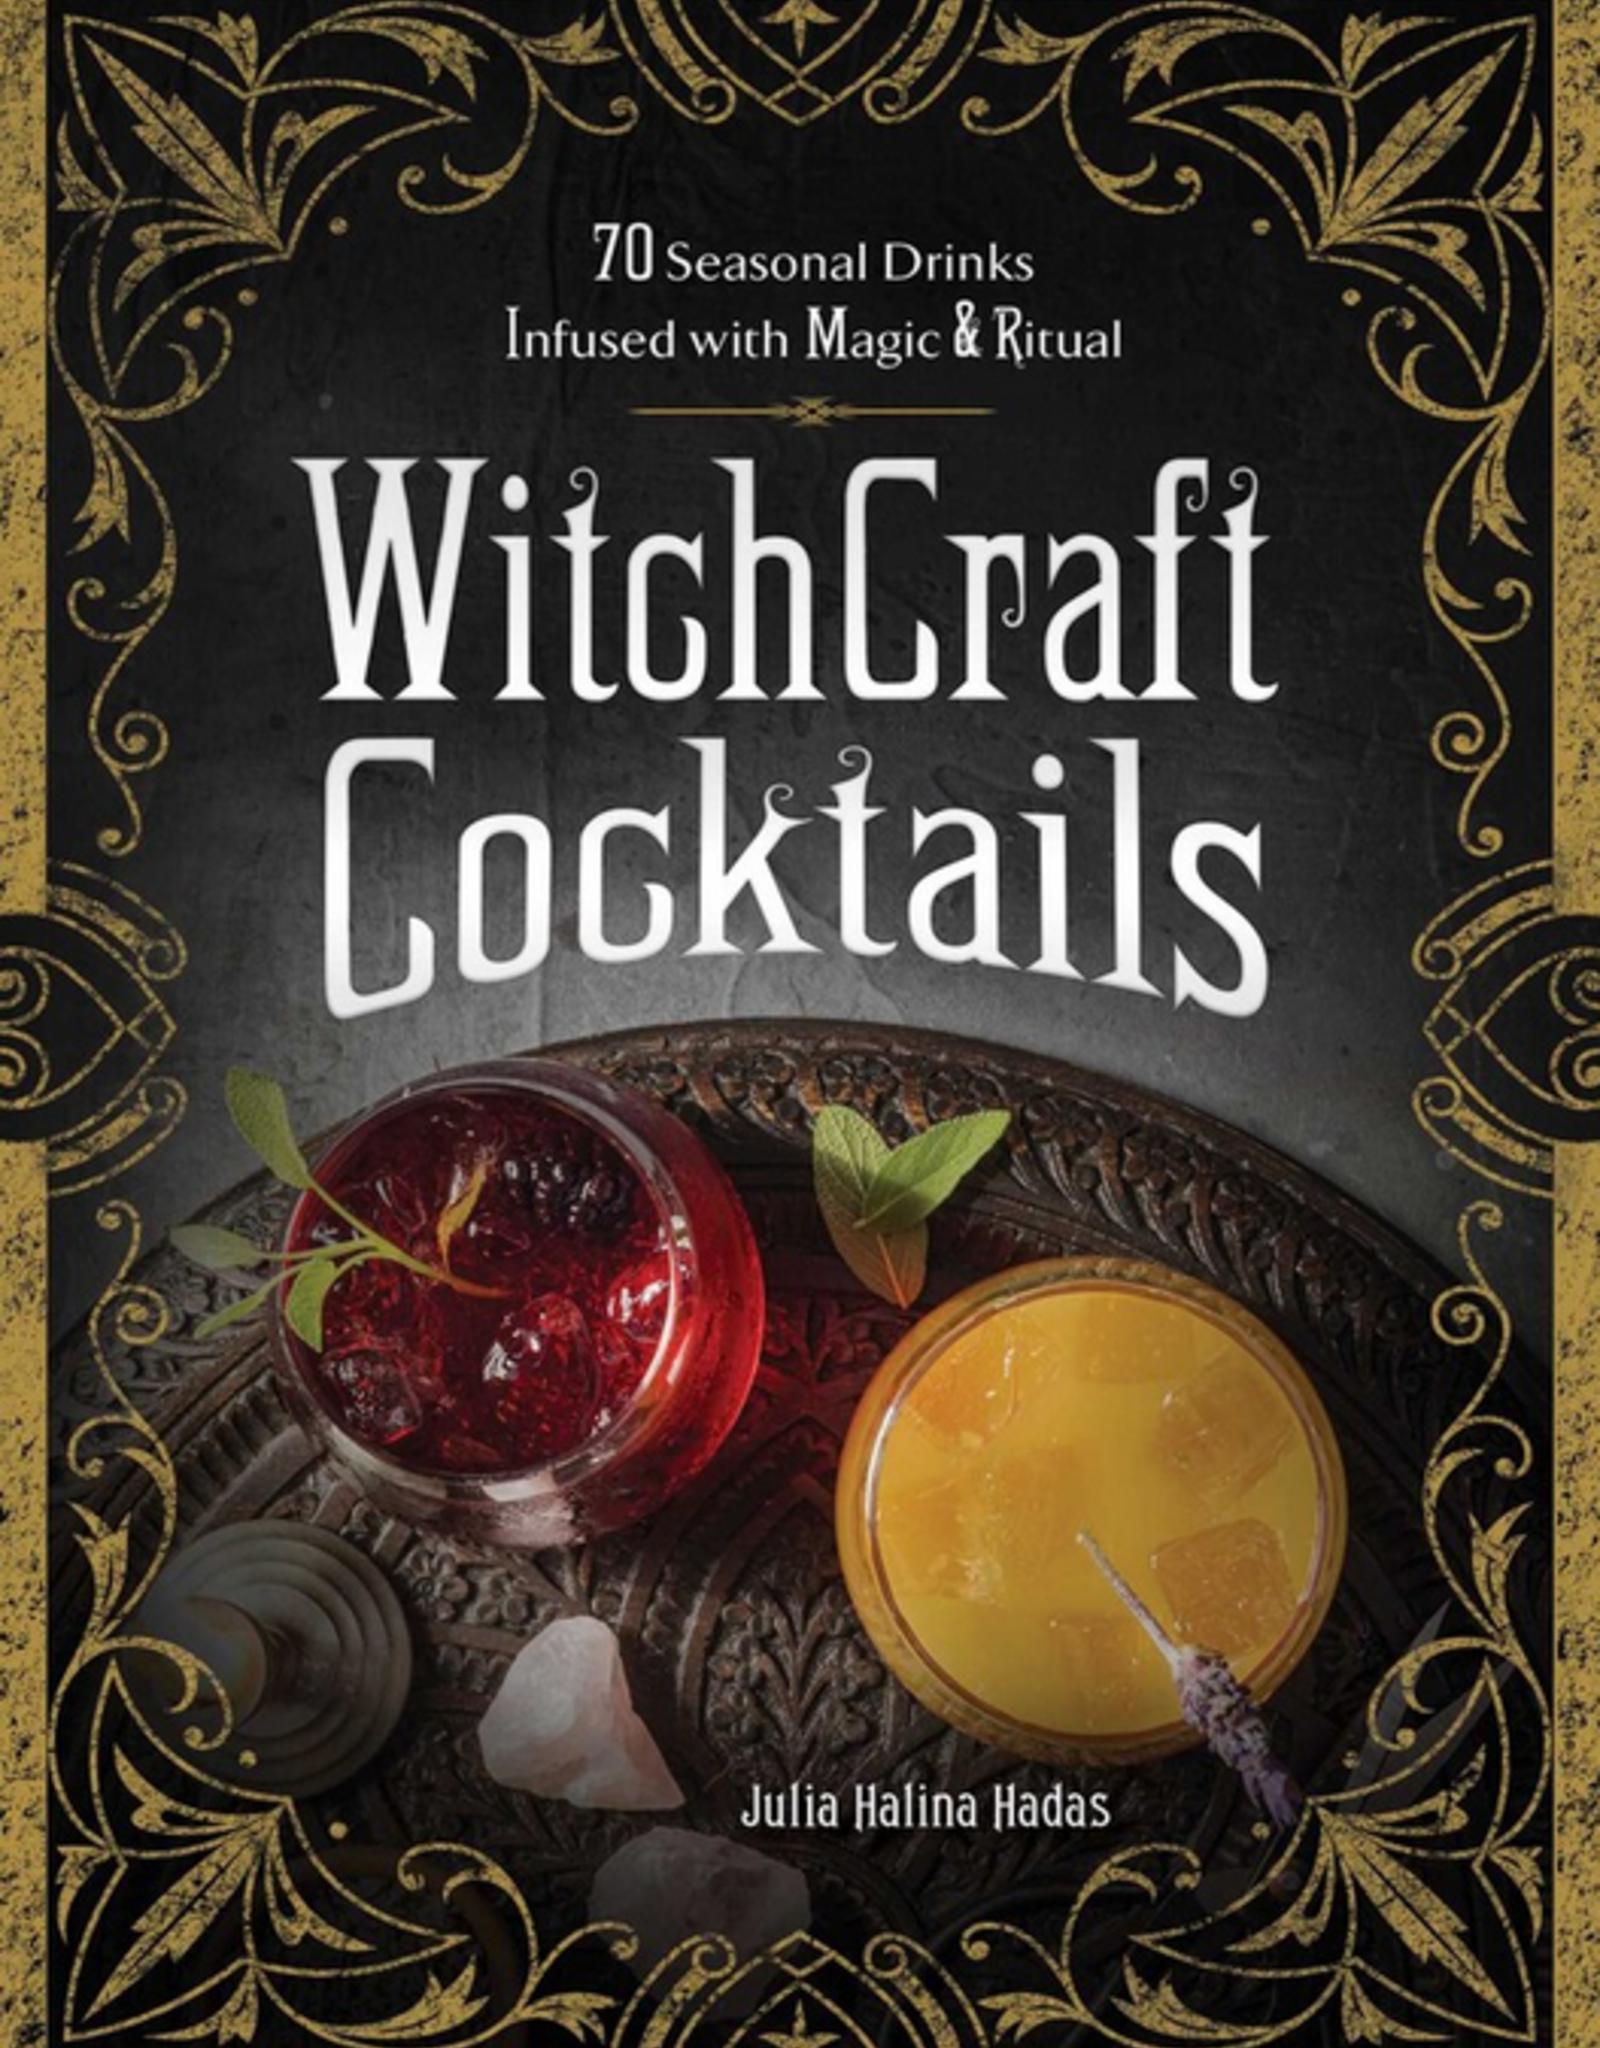 Simon & Schuster Witchcraft Cocktails